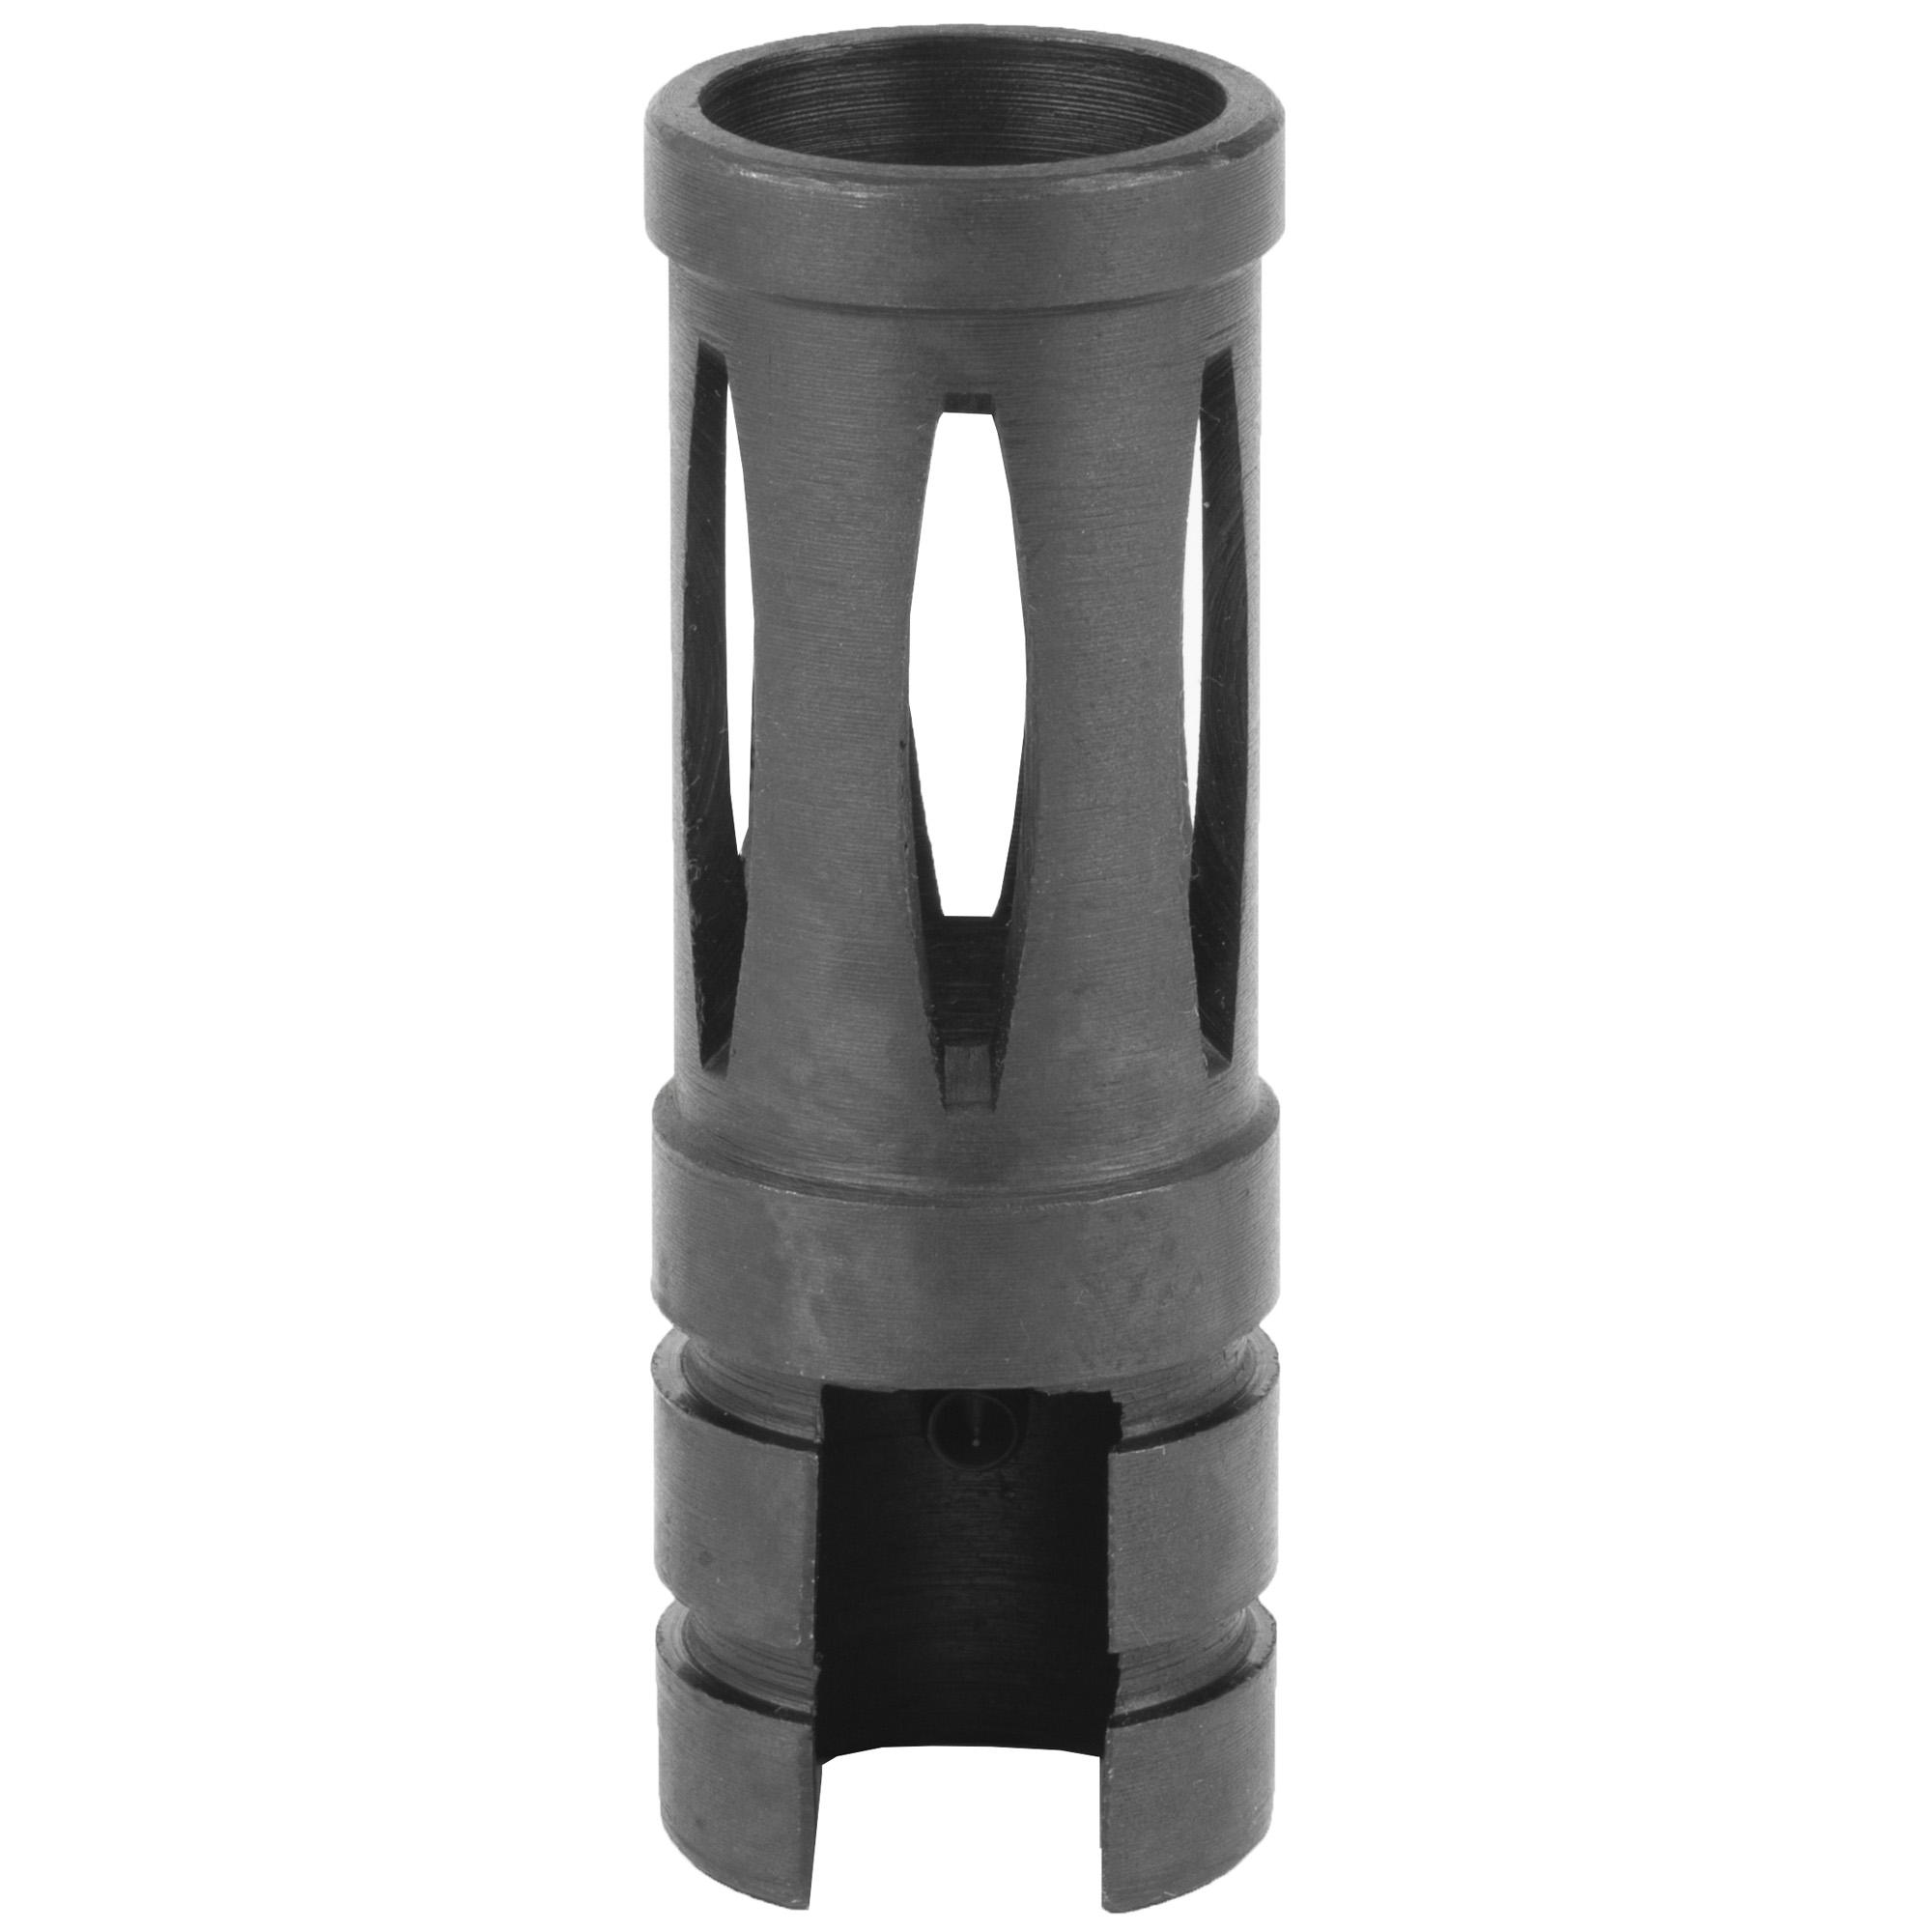 NCSTAR 1/2X28 22 LR Brake – Black